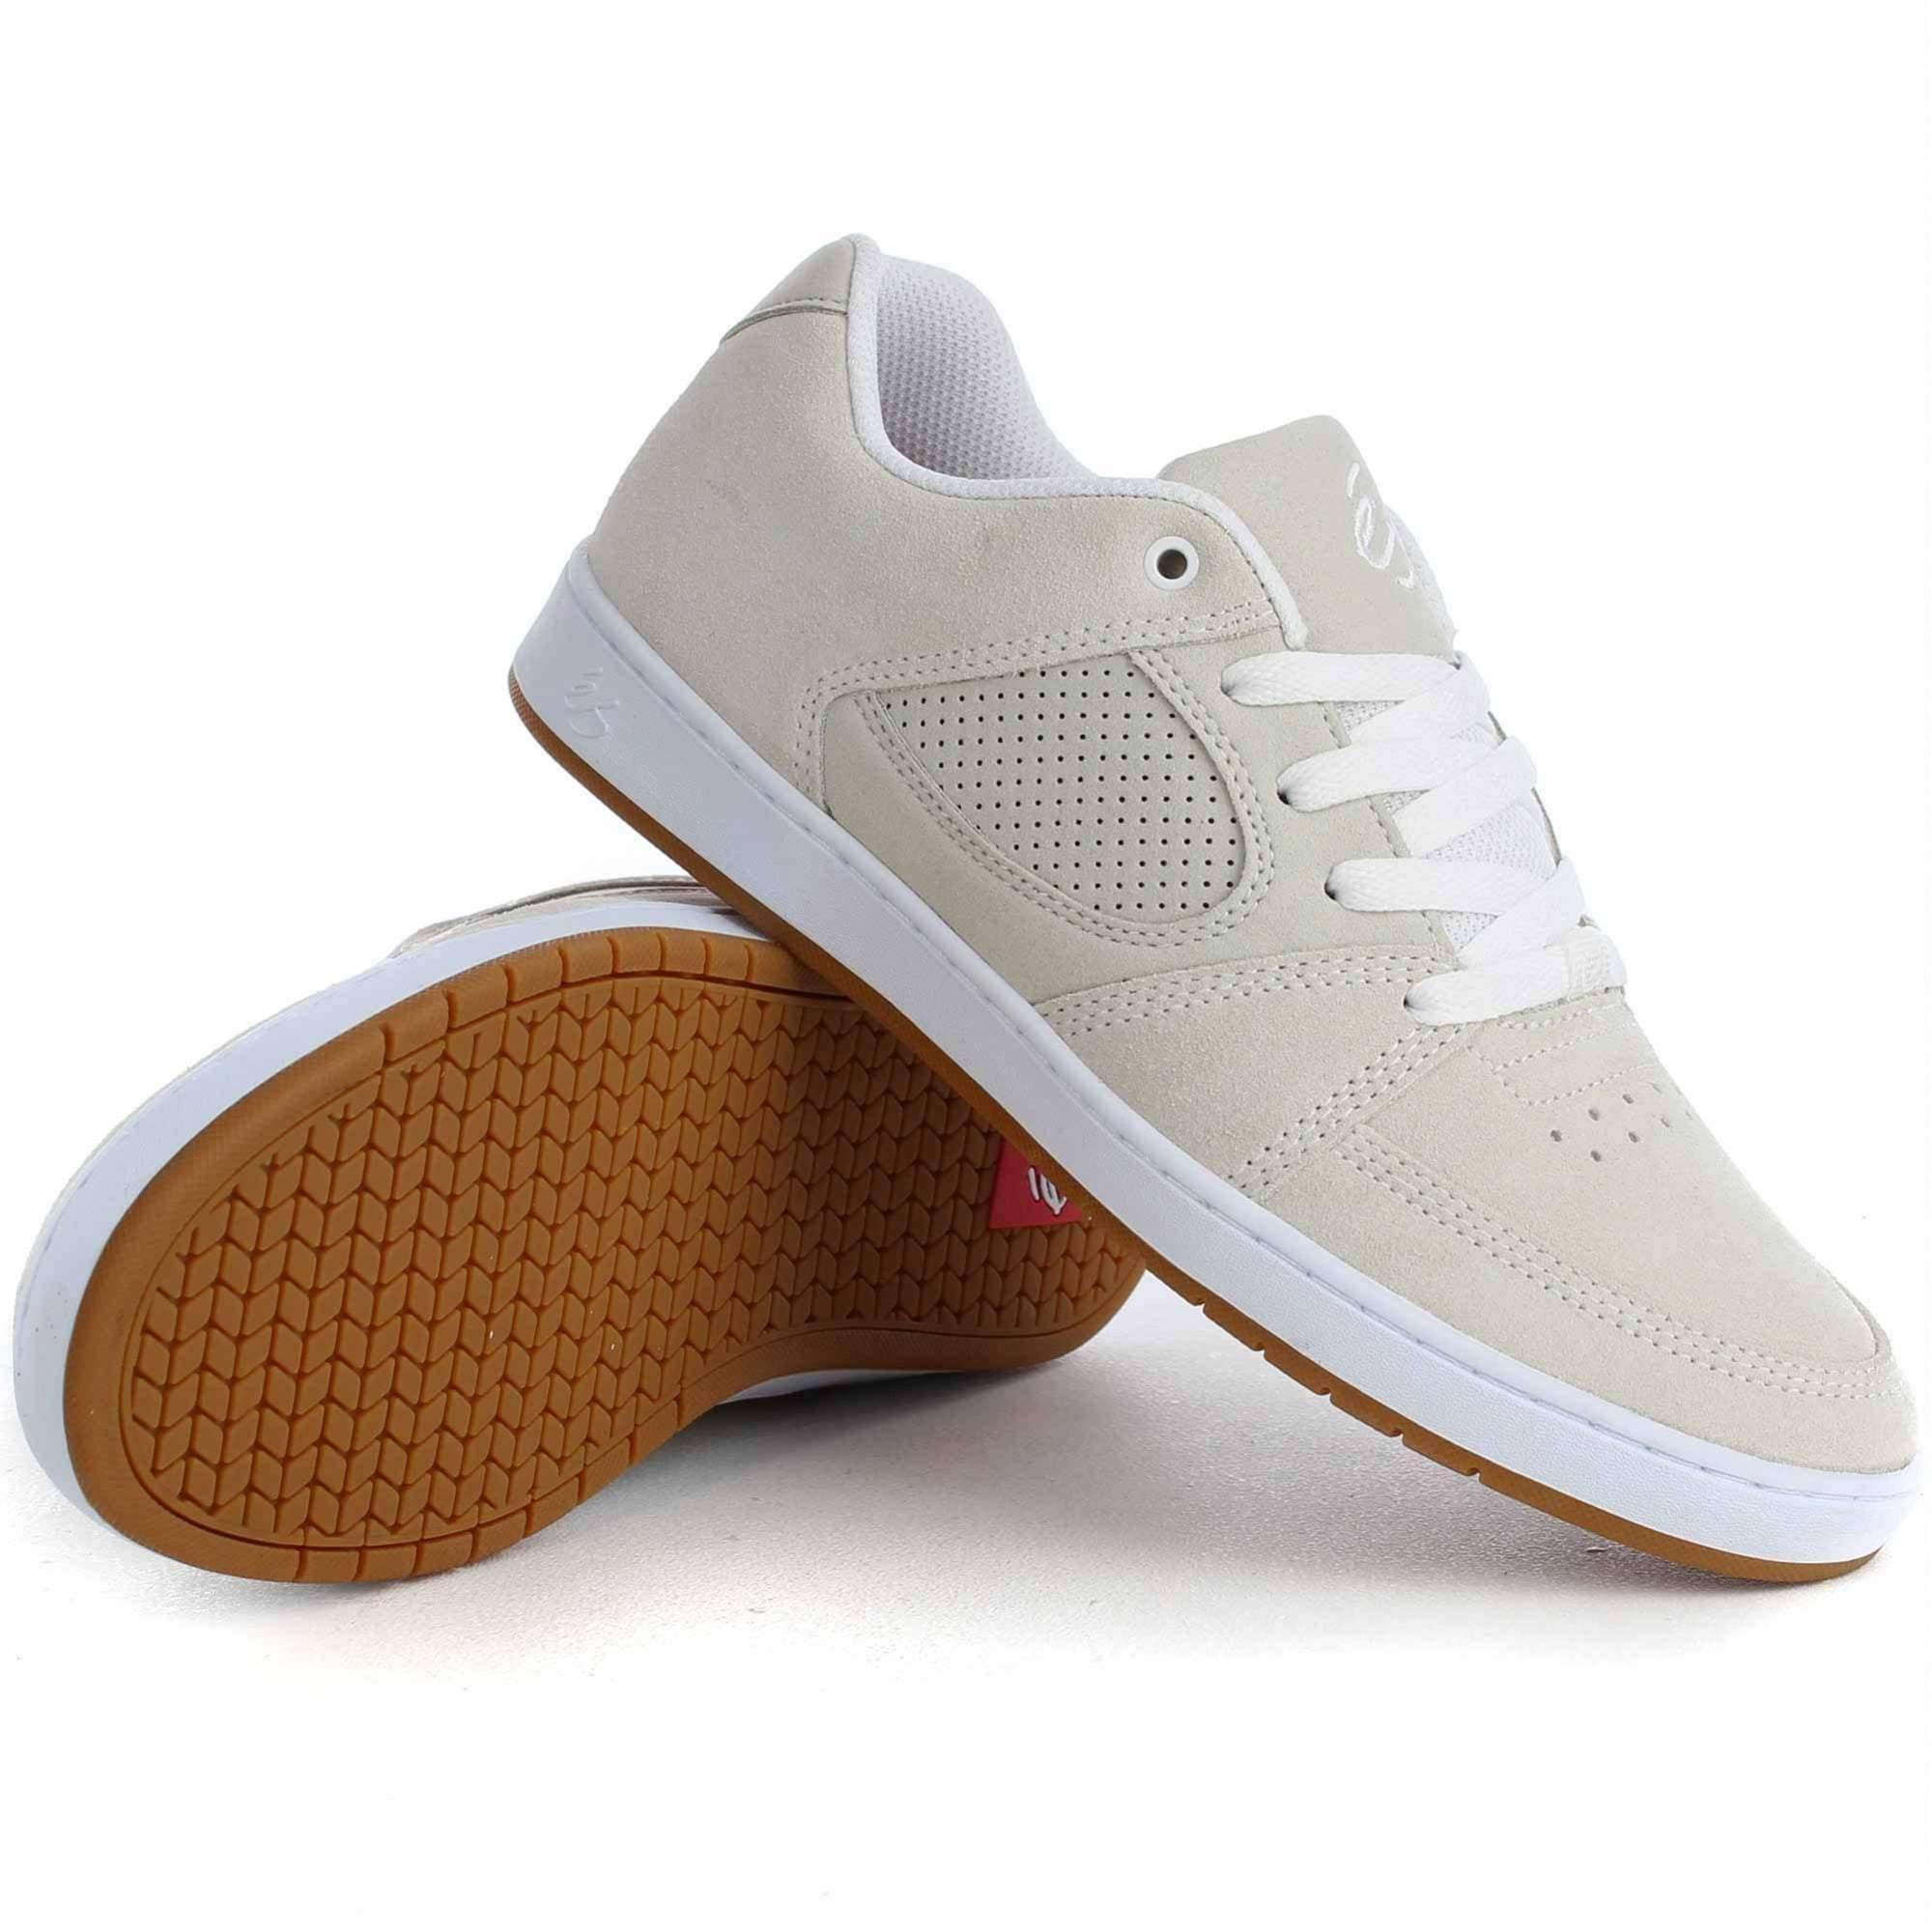 eS Accel Slim Shoes White White Gum